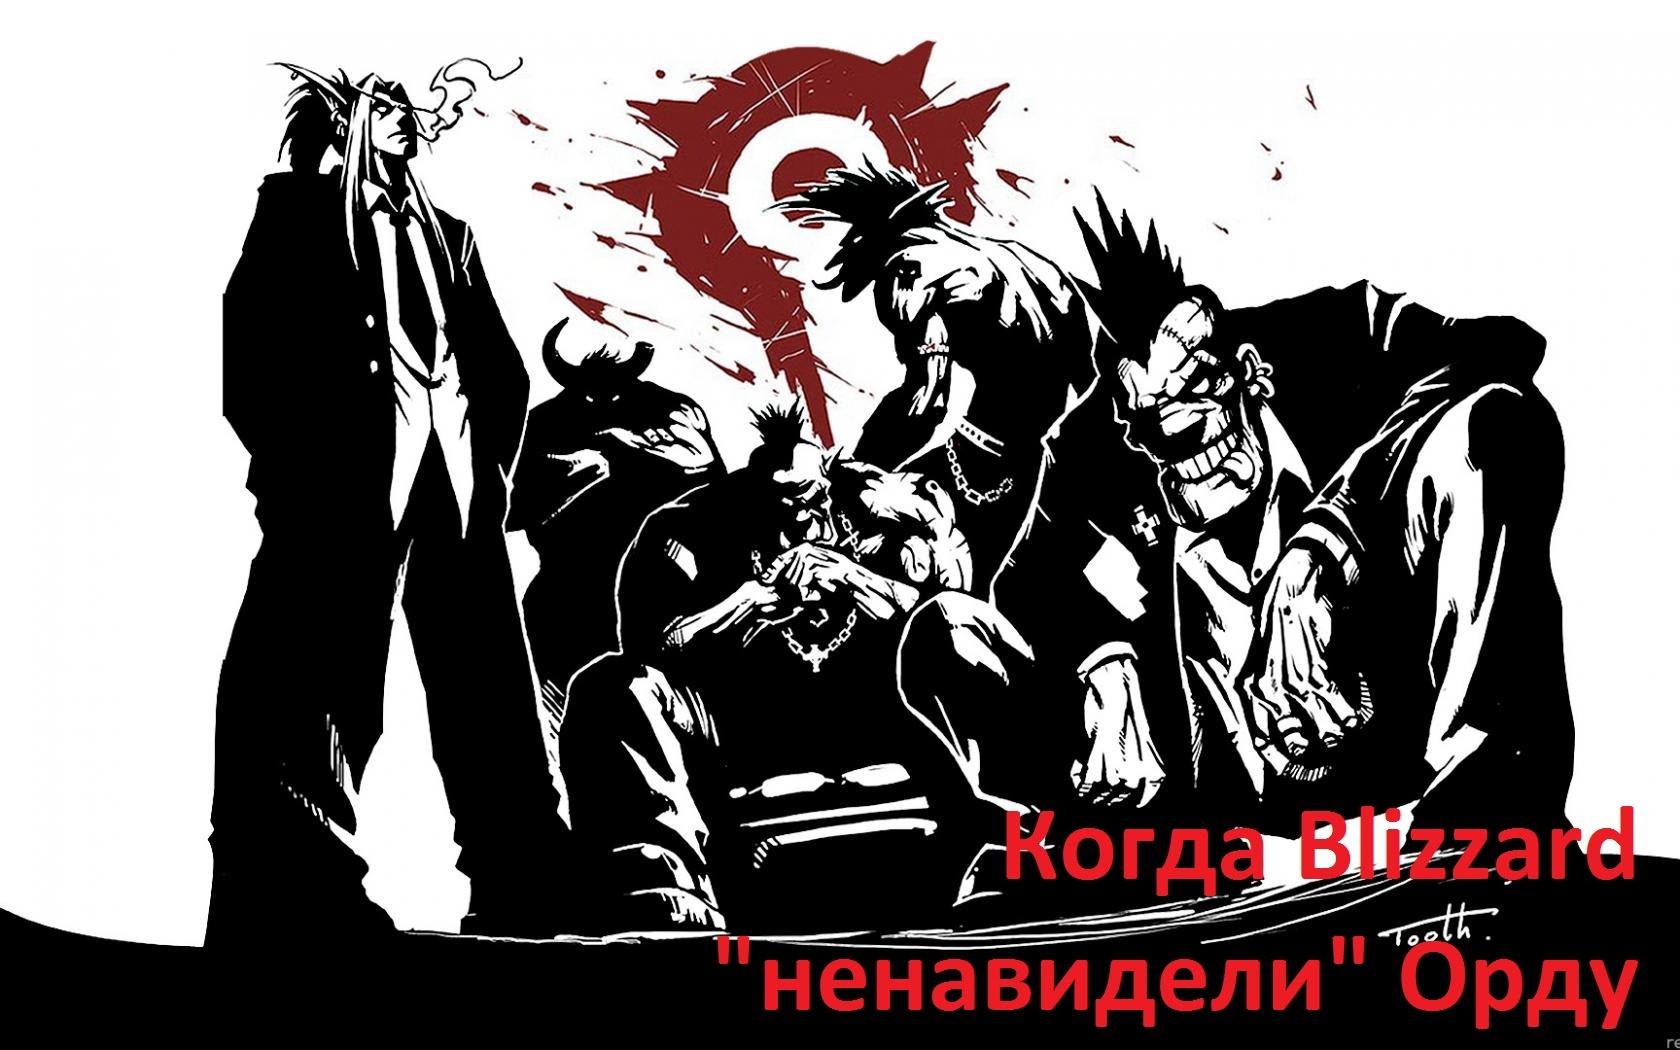 http://mmoboom.ru/media/images/ec3350cd6e51f62b.jpg